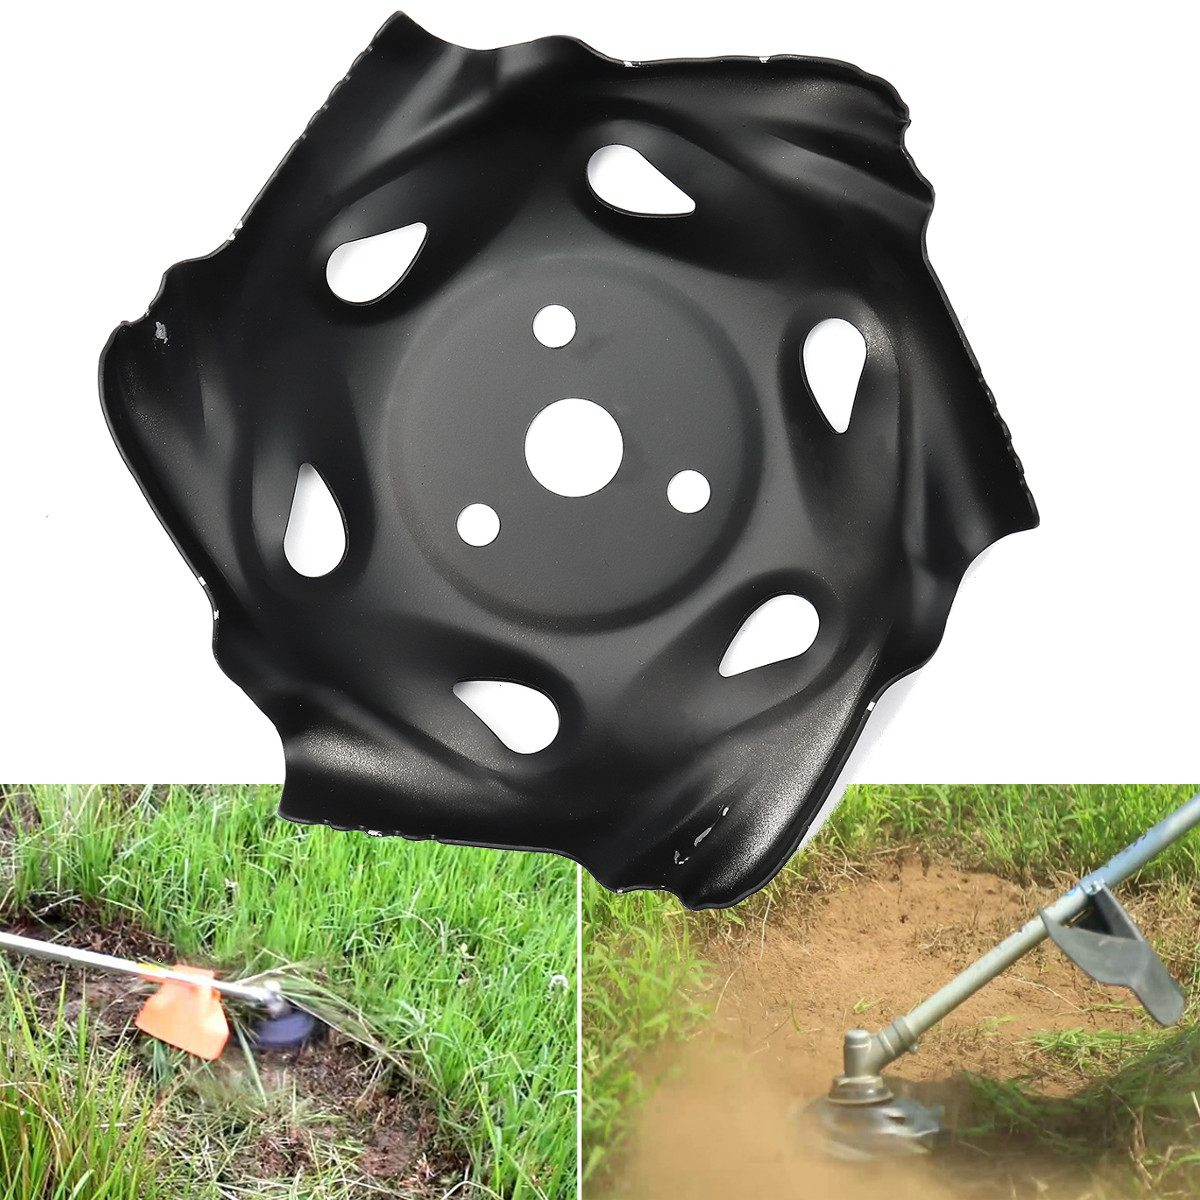 Metal Grass Mowing Lawnmower Weeding Tray Trimmer Head Machine Accessories Garden Power Tool Lawn Mower Parts Black